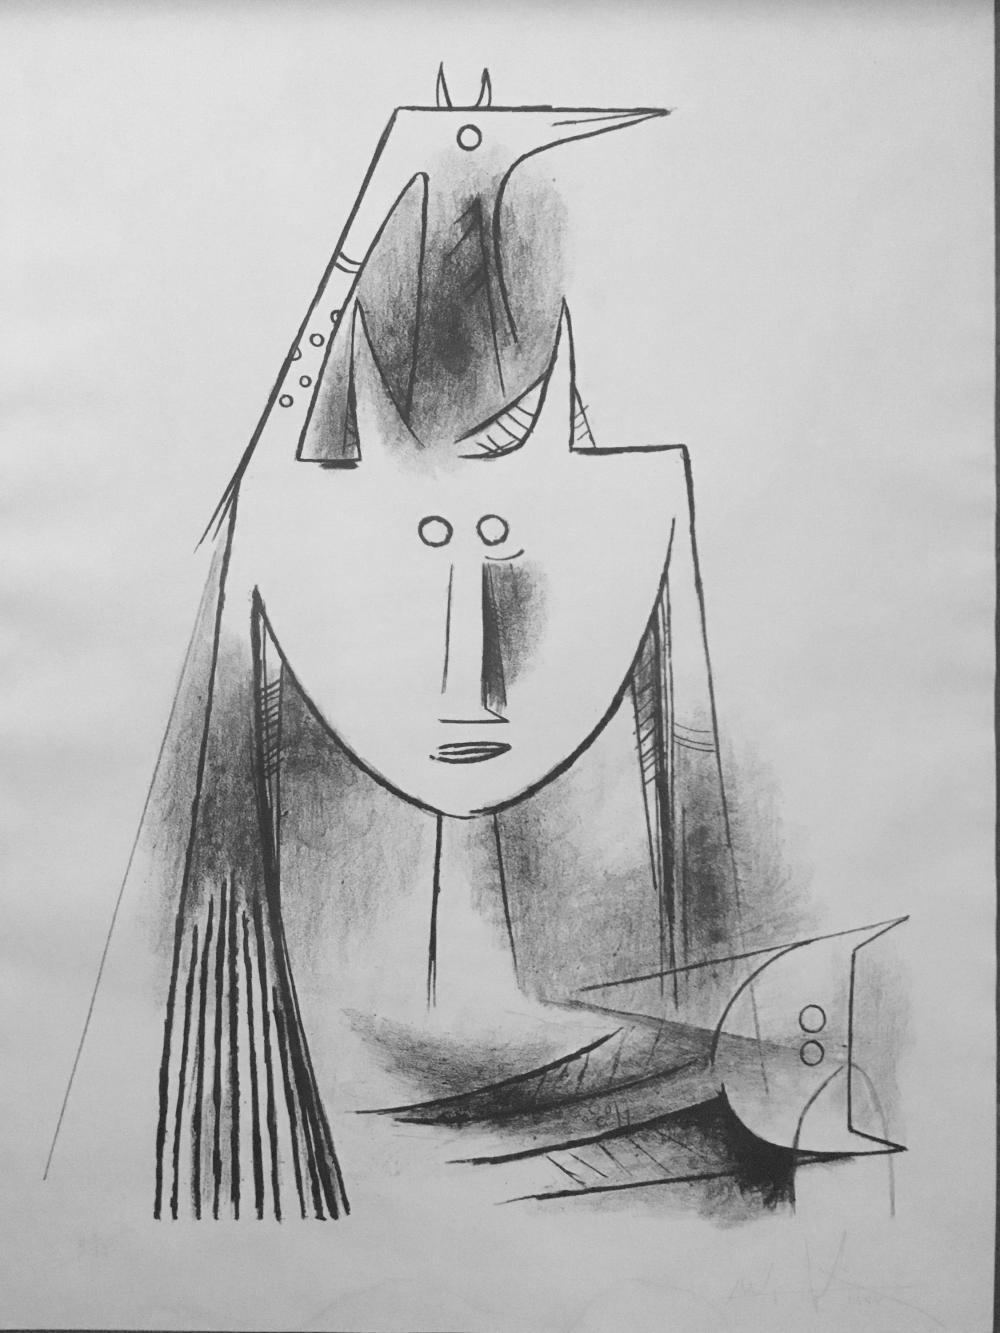 Wifredo Lam, Primitiv Gestalt (5501), Lithograph